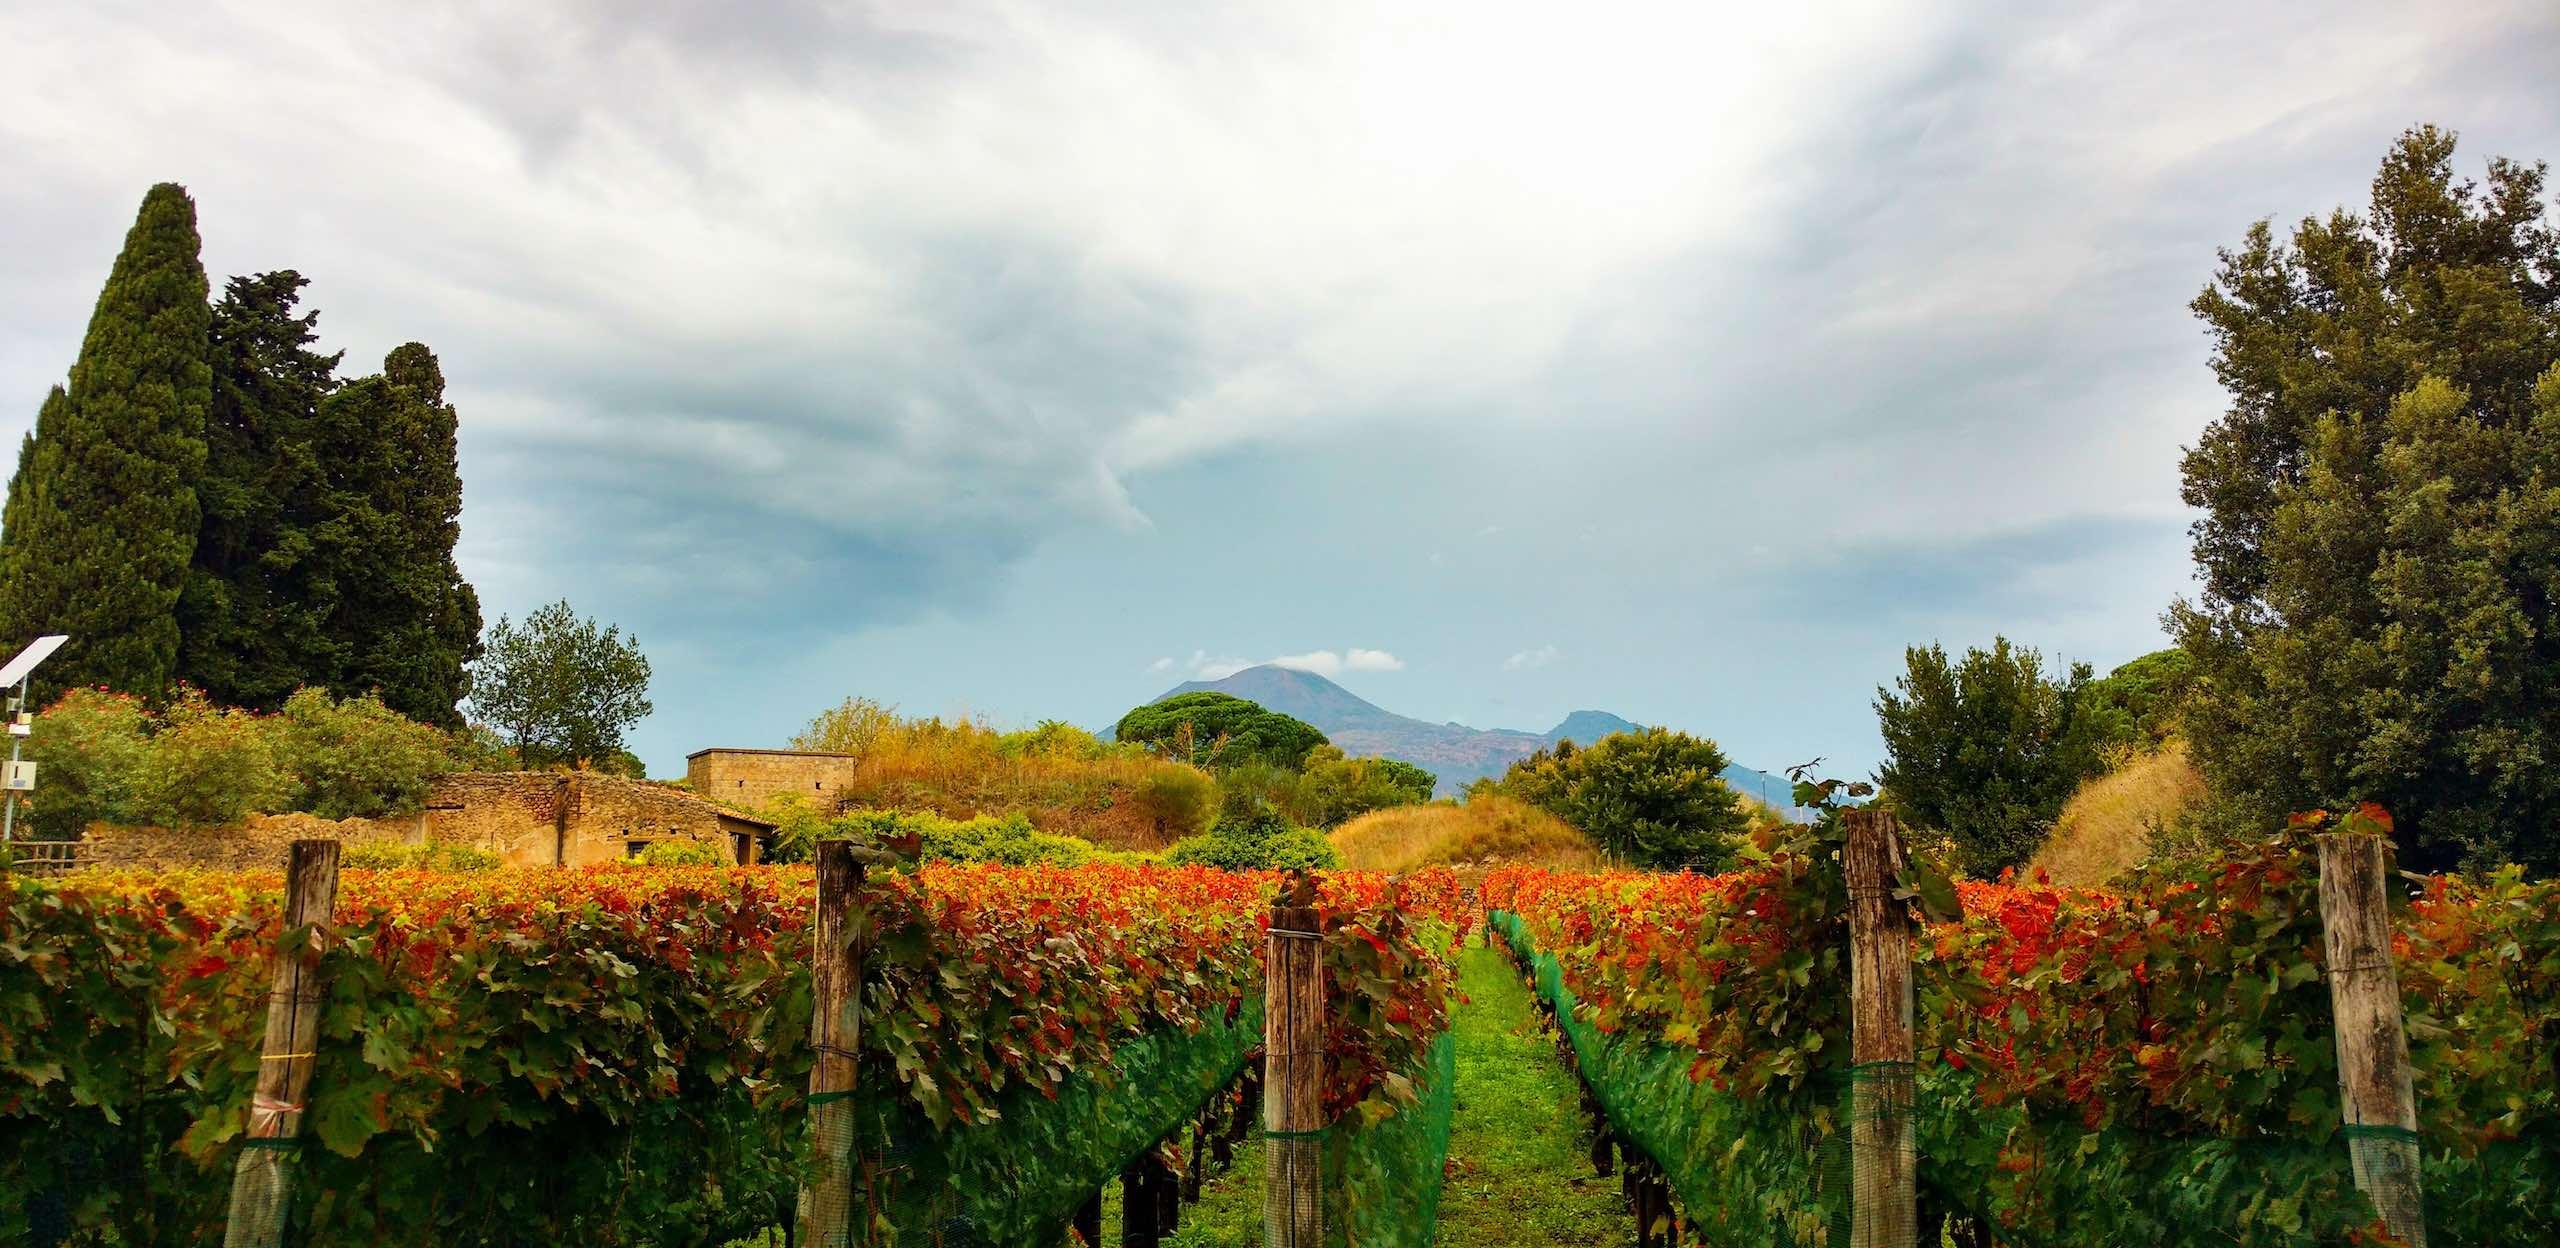 Vesuvius | Photo: Pieter Biesemans